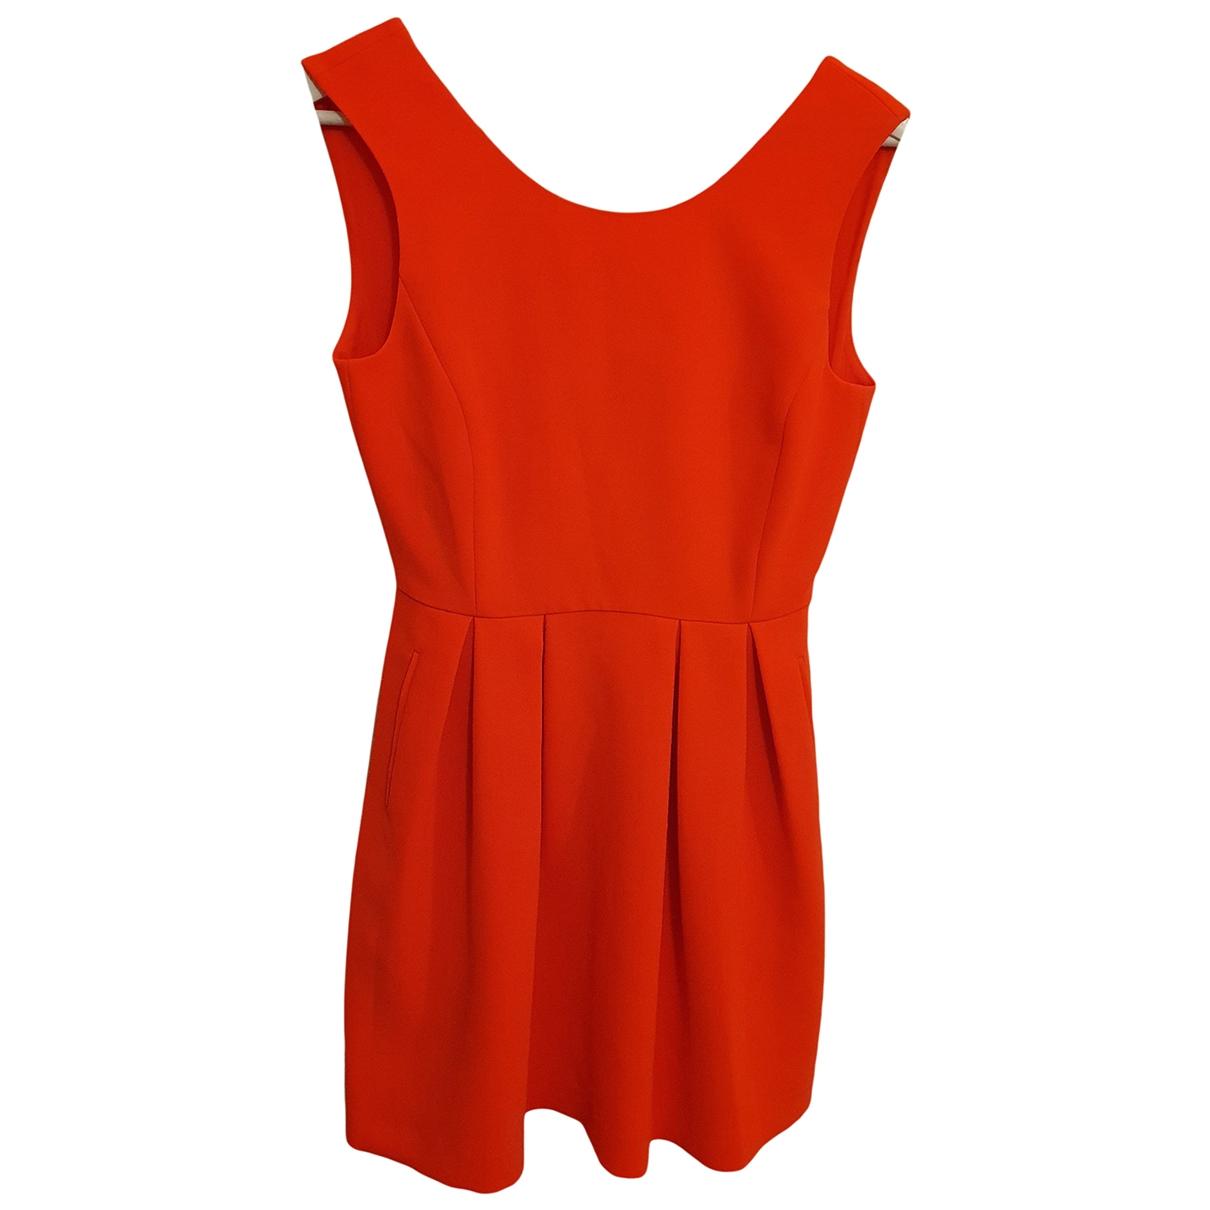 Claudie Pierlot \N Orange dress for Women 36 FR